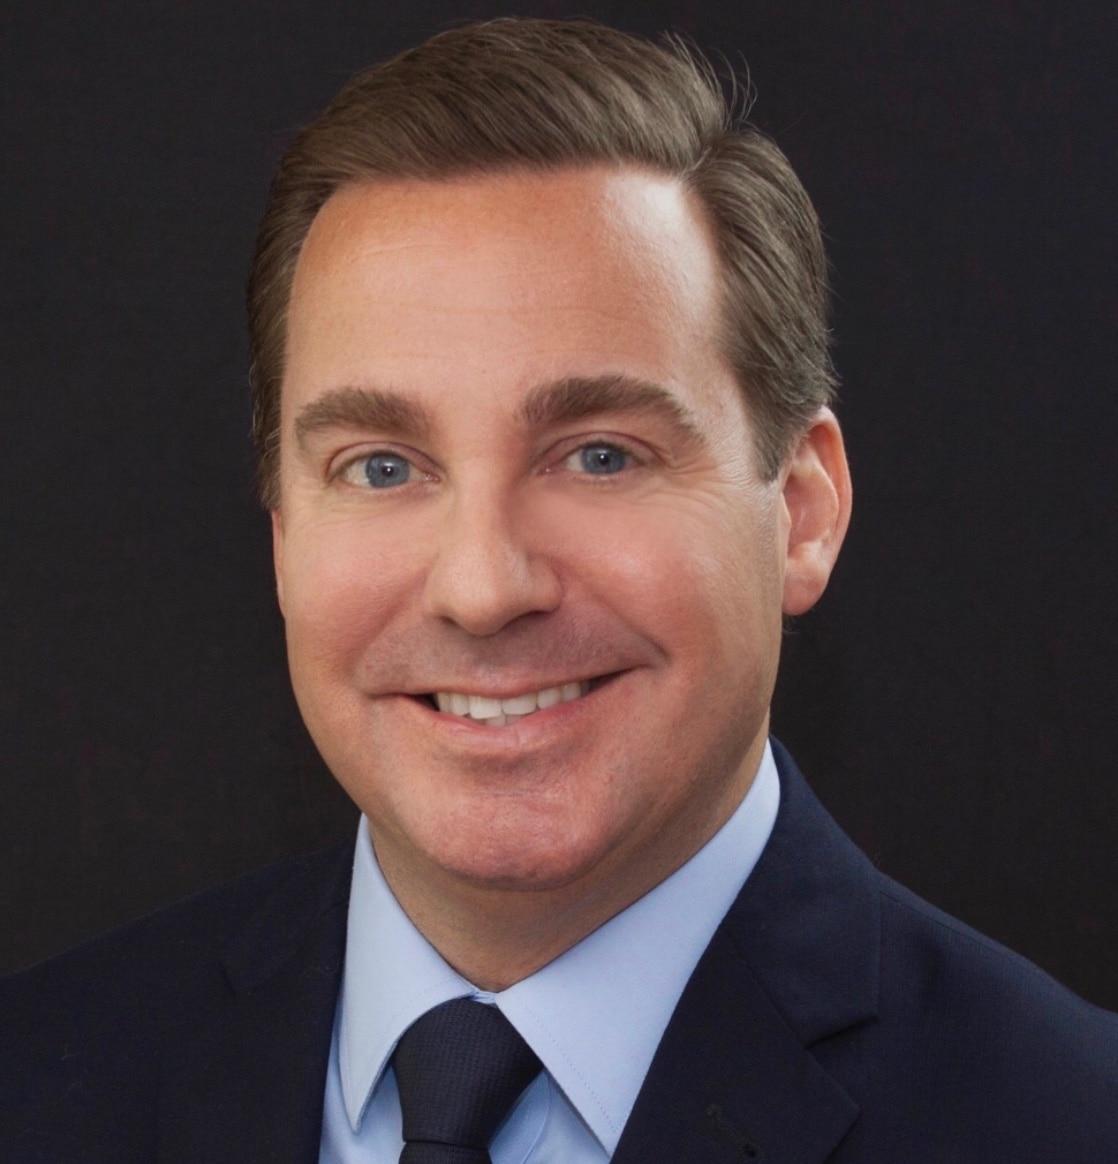 DAVID MATTHEW WILCOX  Your Financial Professional & Insurance Agent